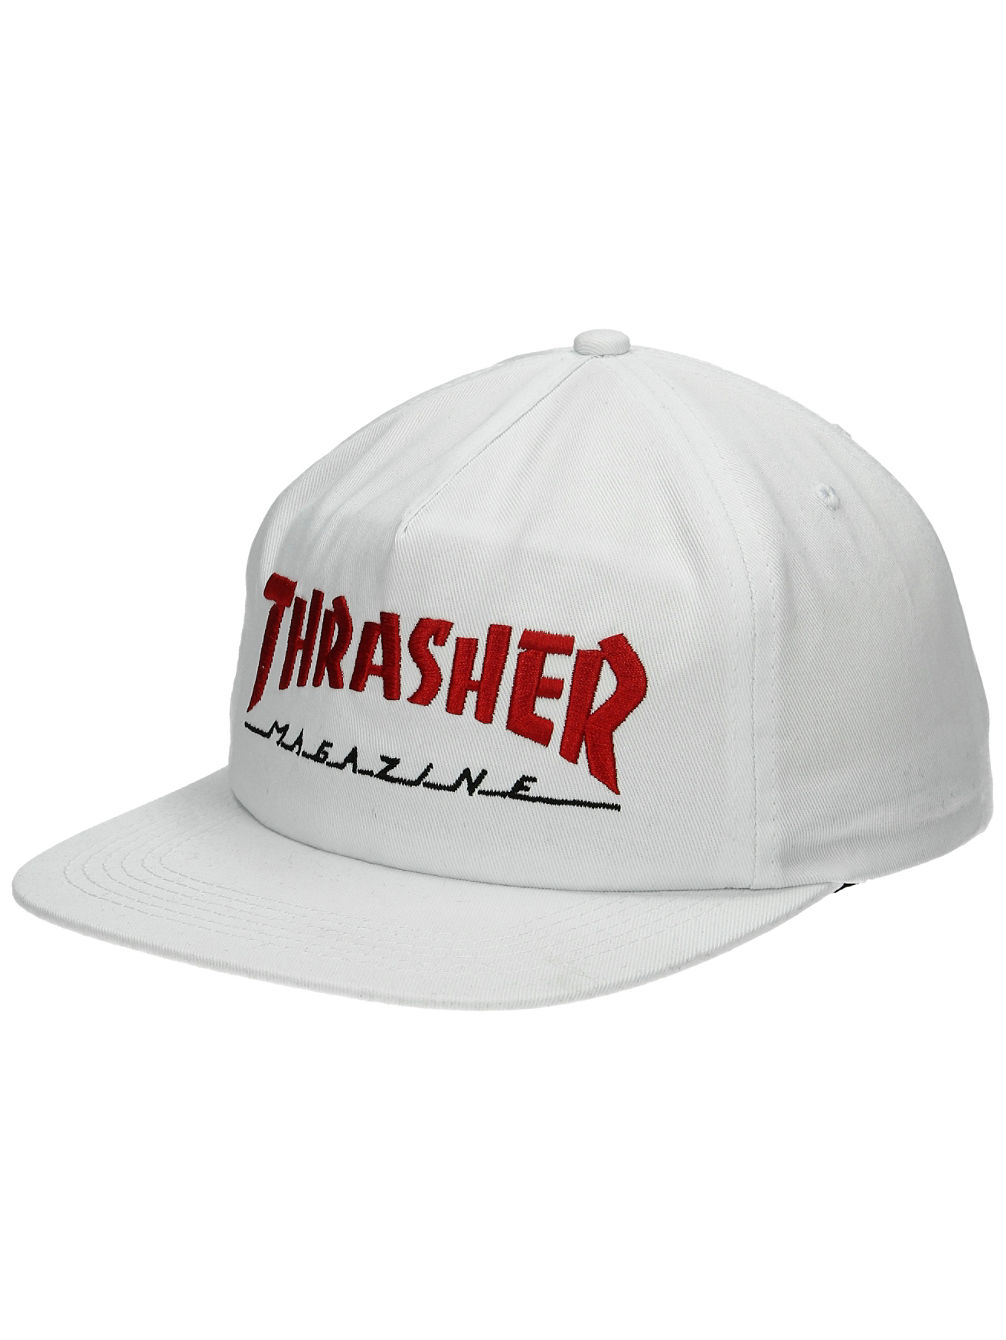 1de10c14fda Buy Thrasher Two Tone Magazine Logo Cap online at Blue Tomato